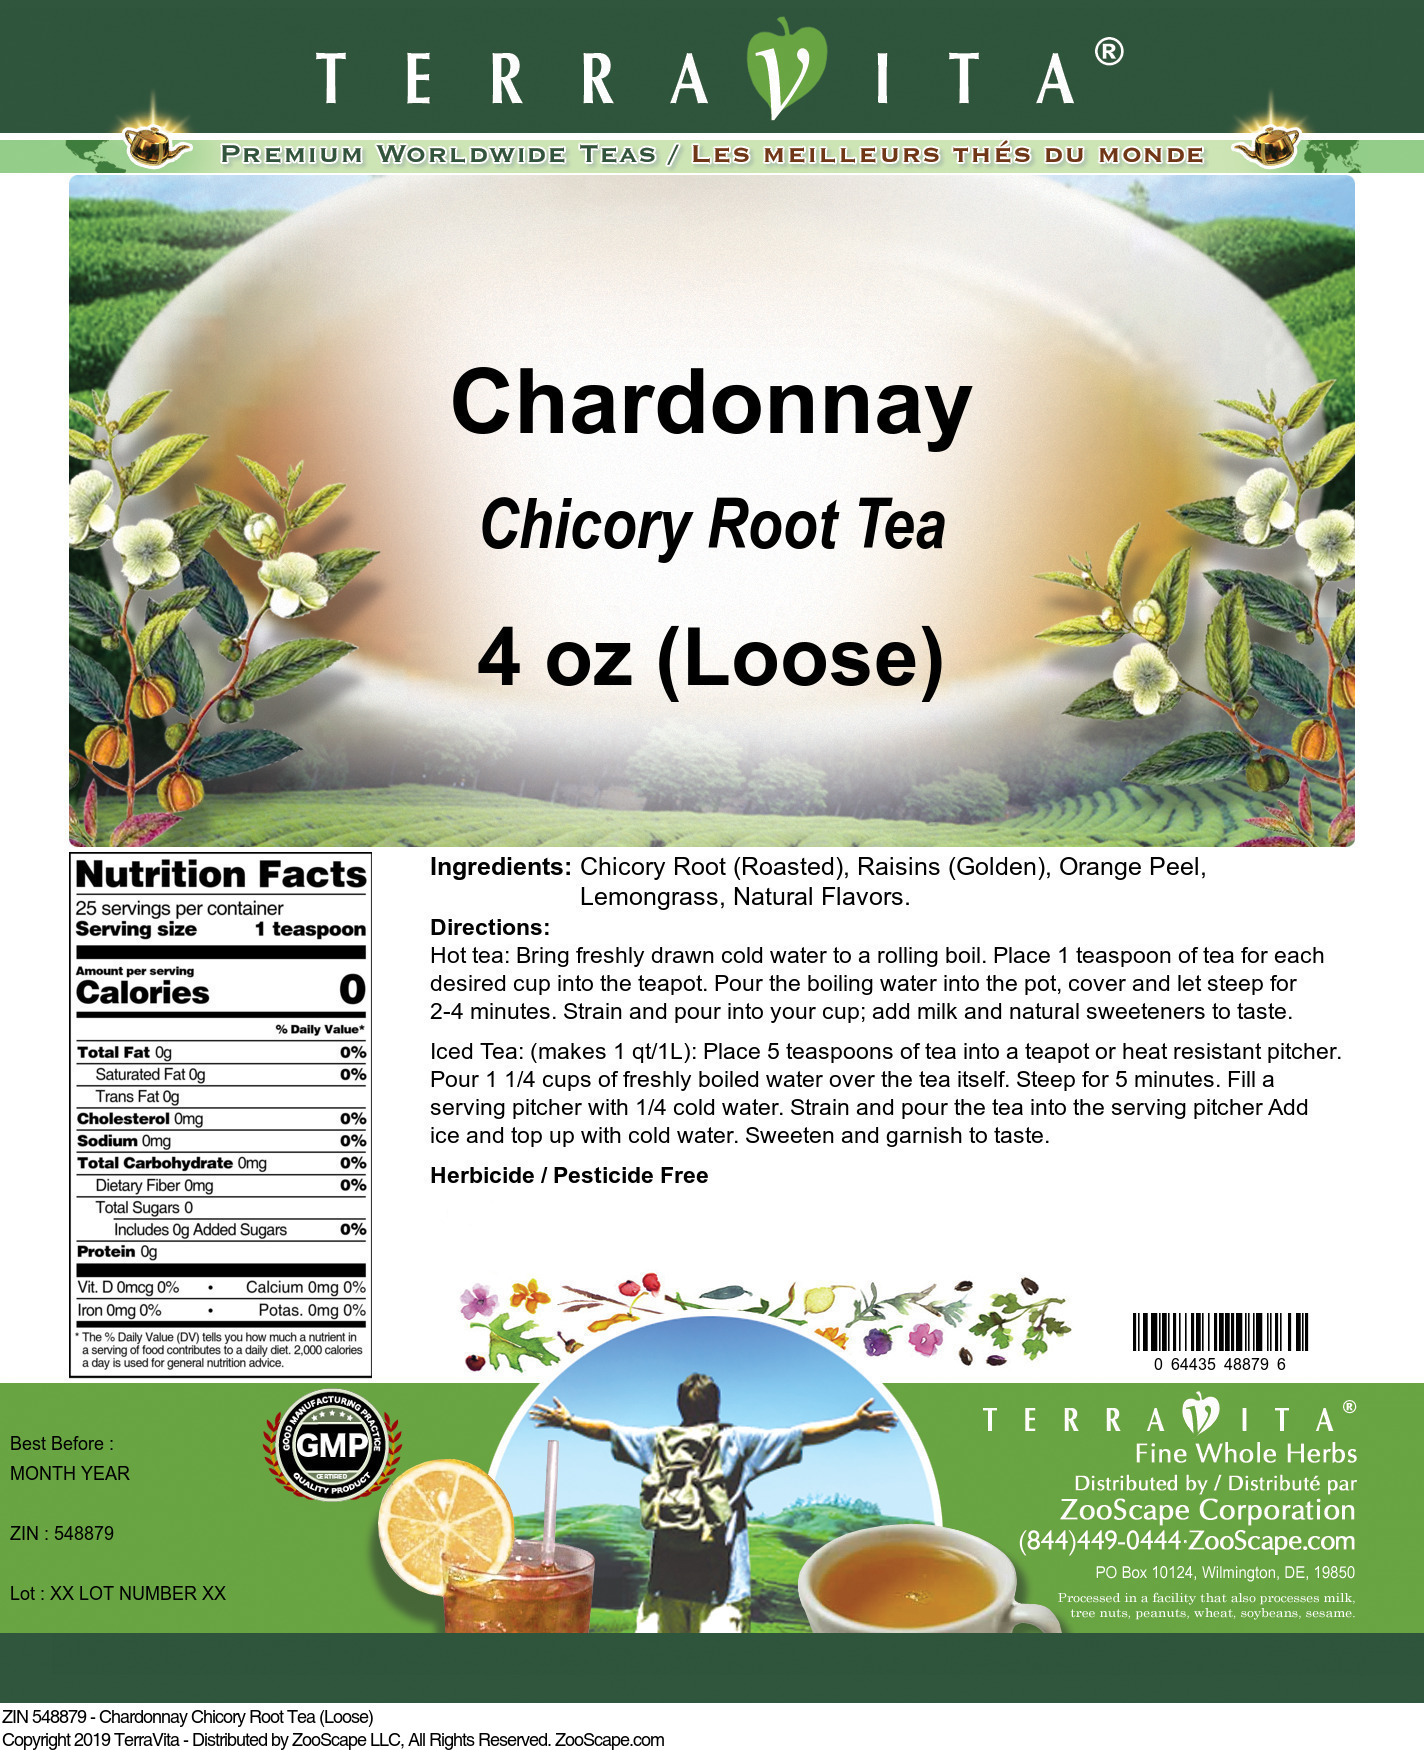 Chardonnay Chicory Root